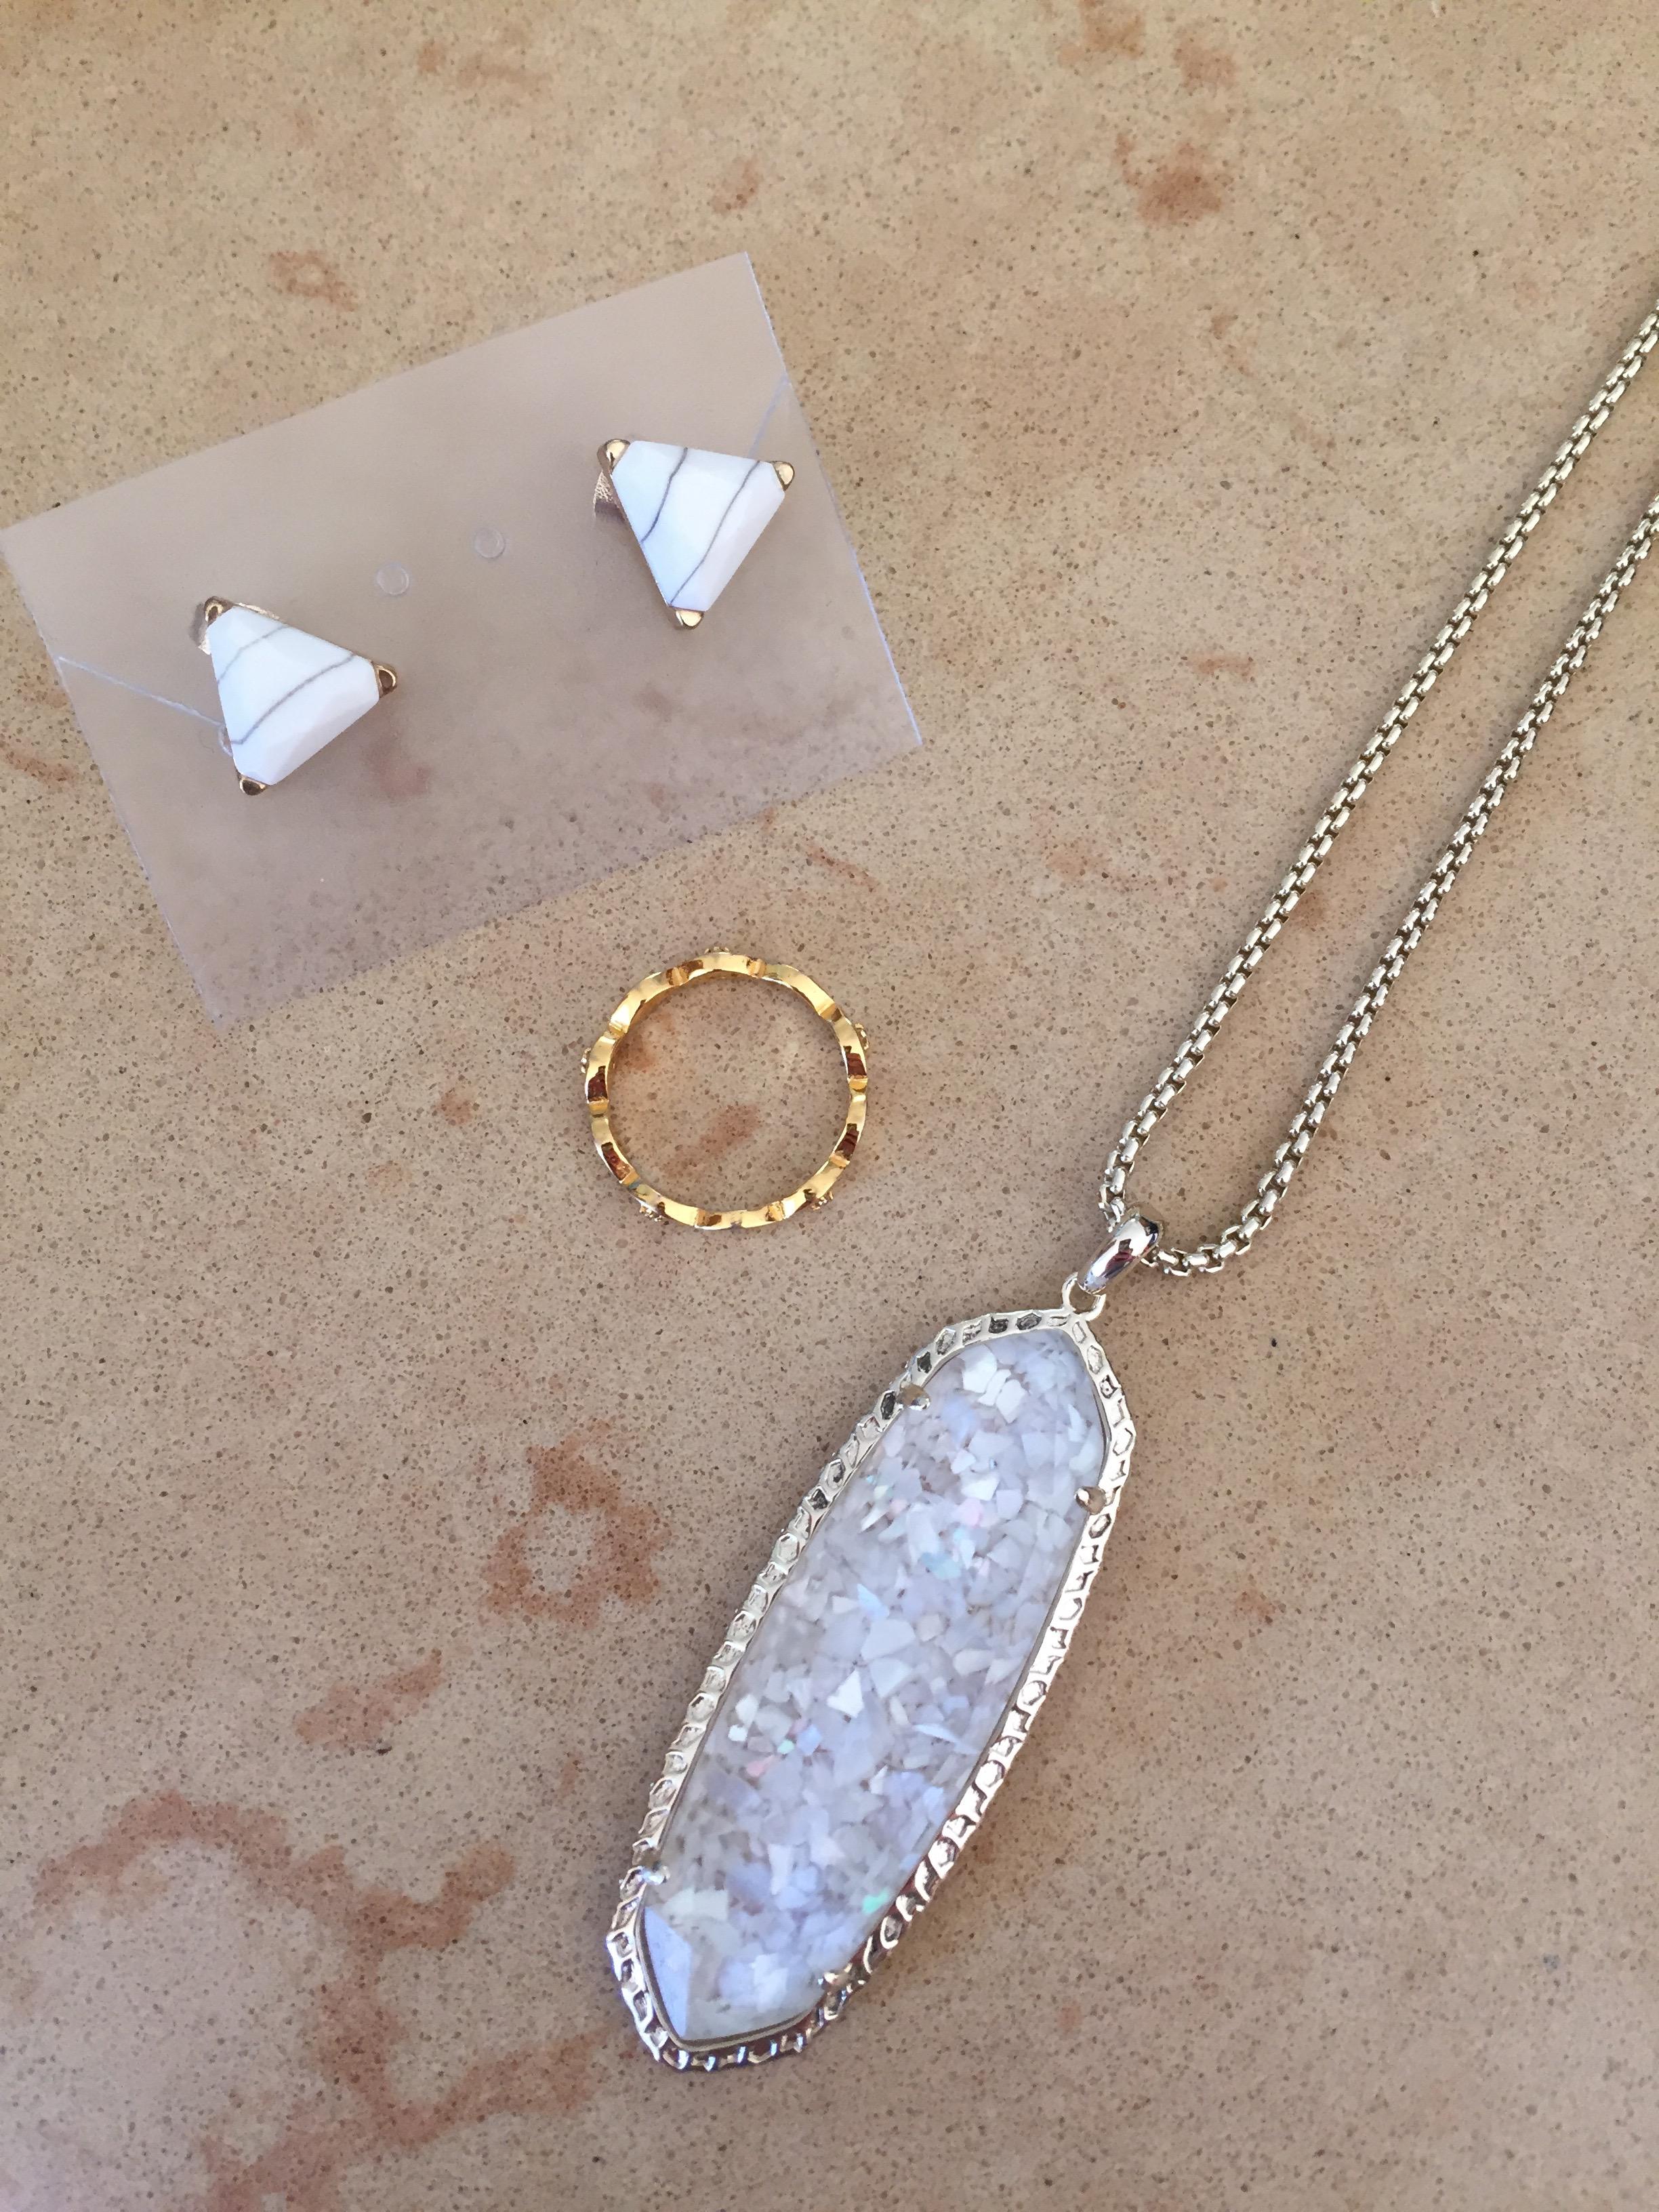 Women's fashion jewelry